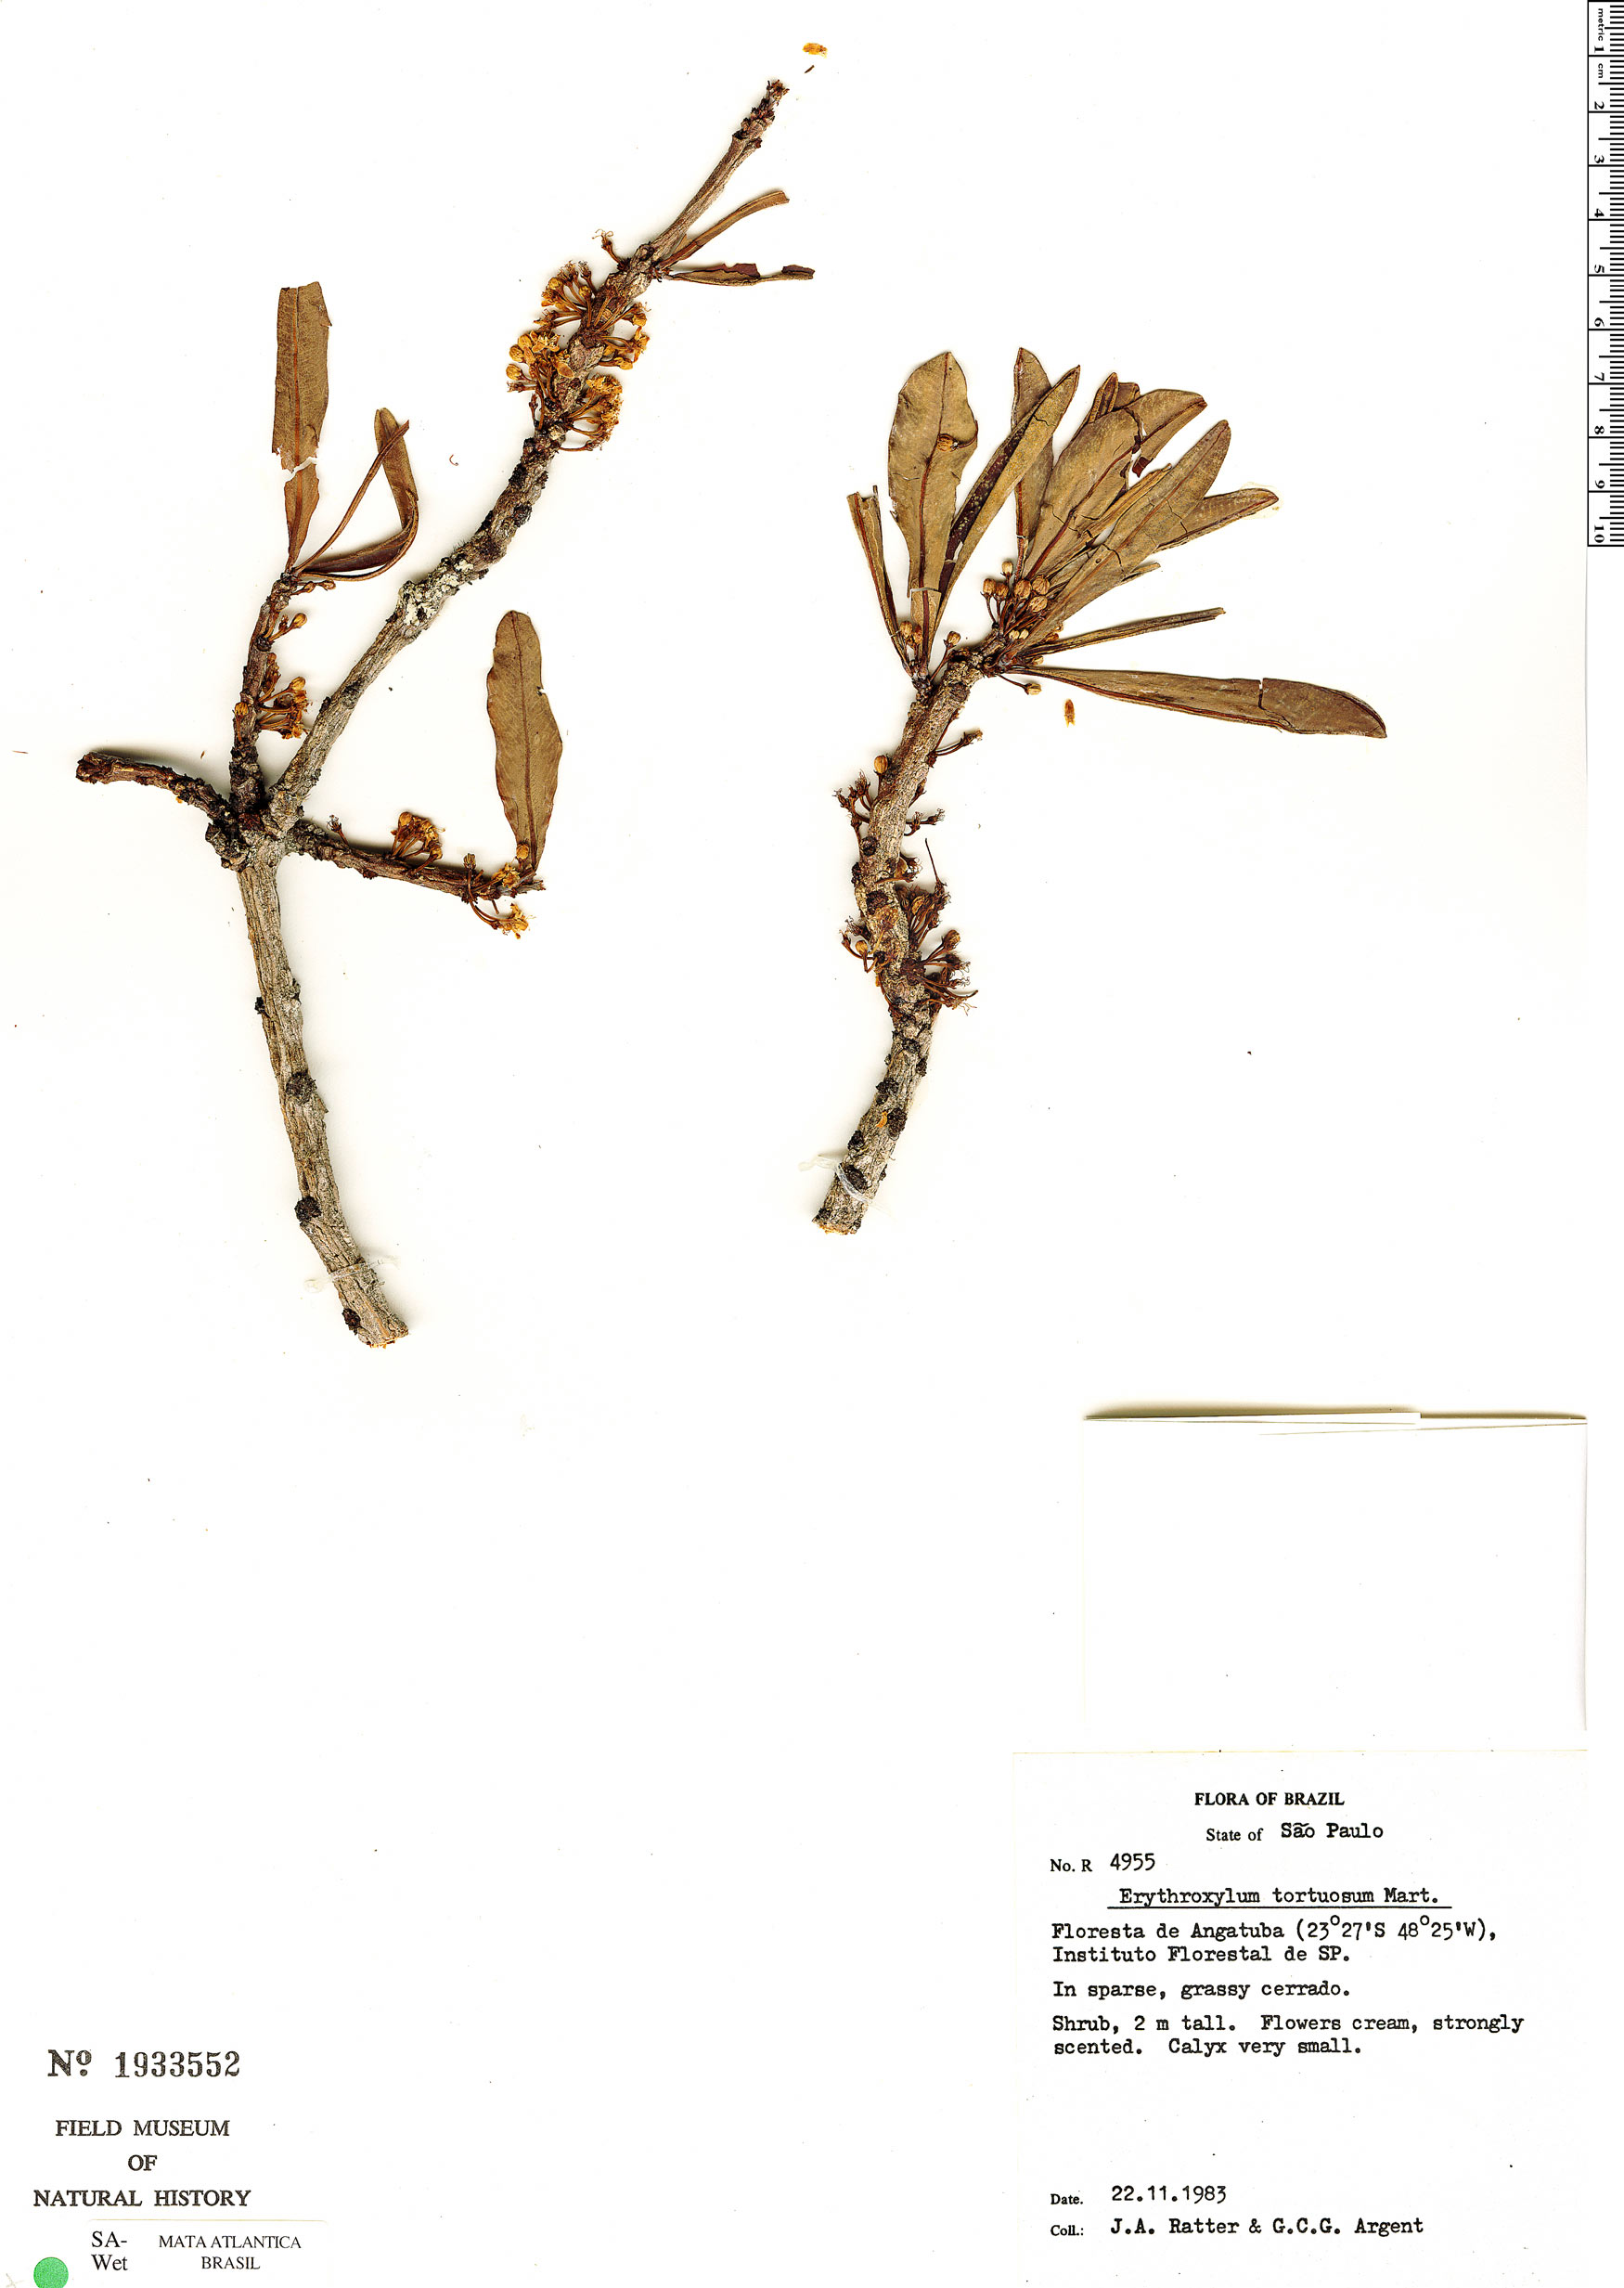 Specimen: Erythroxylum tortuosum